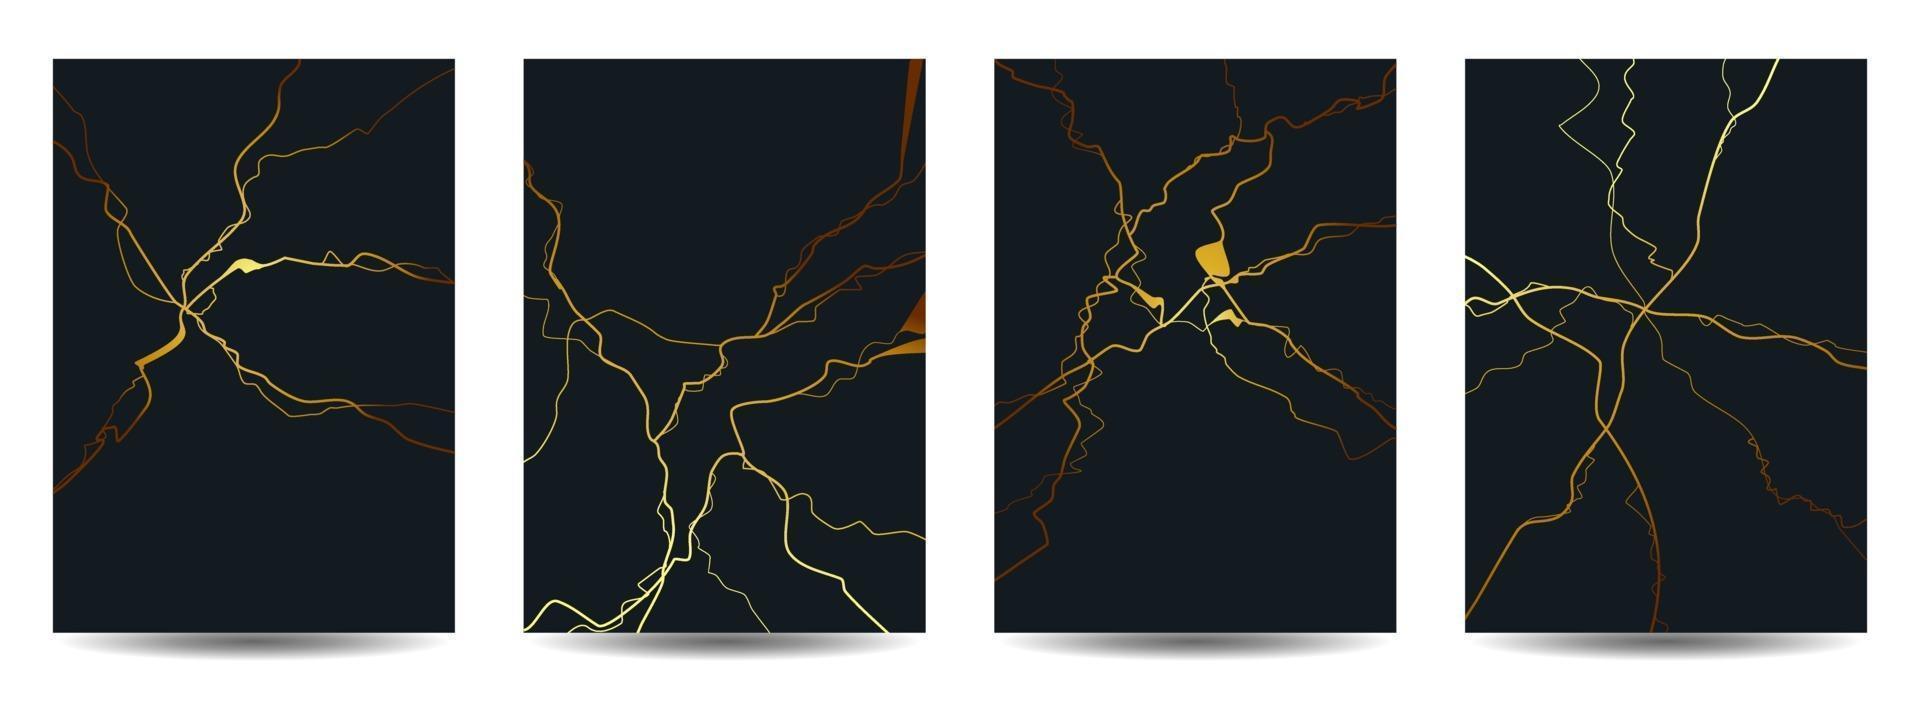 guld kintsugi täcka design bakgrund vektor